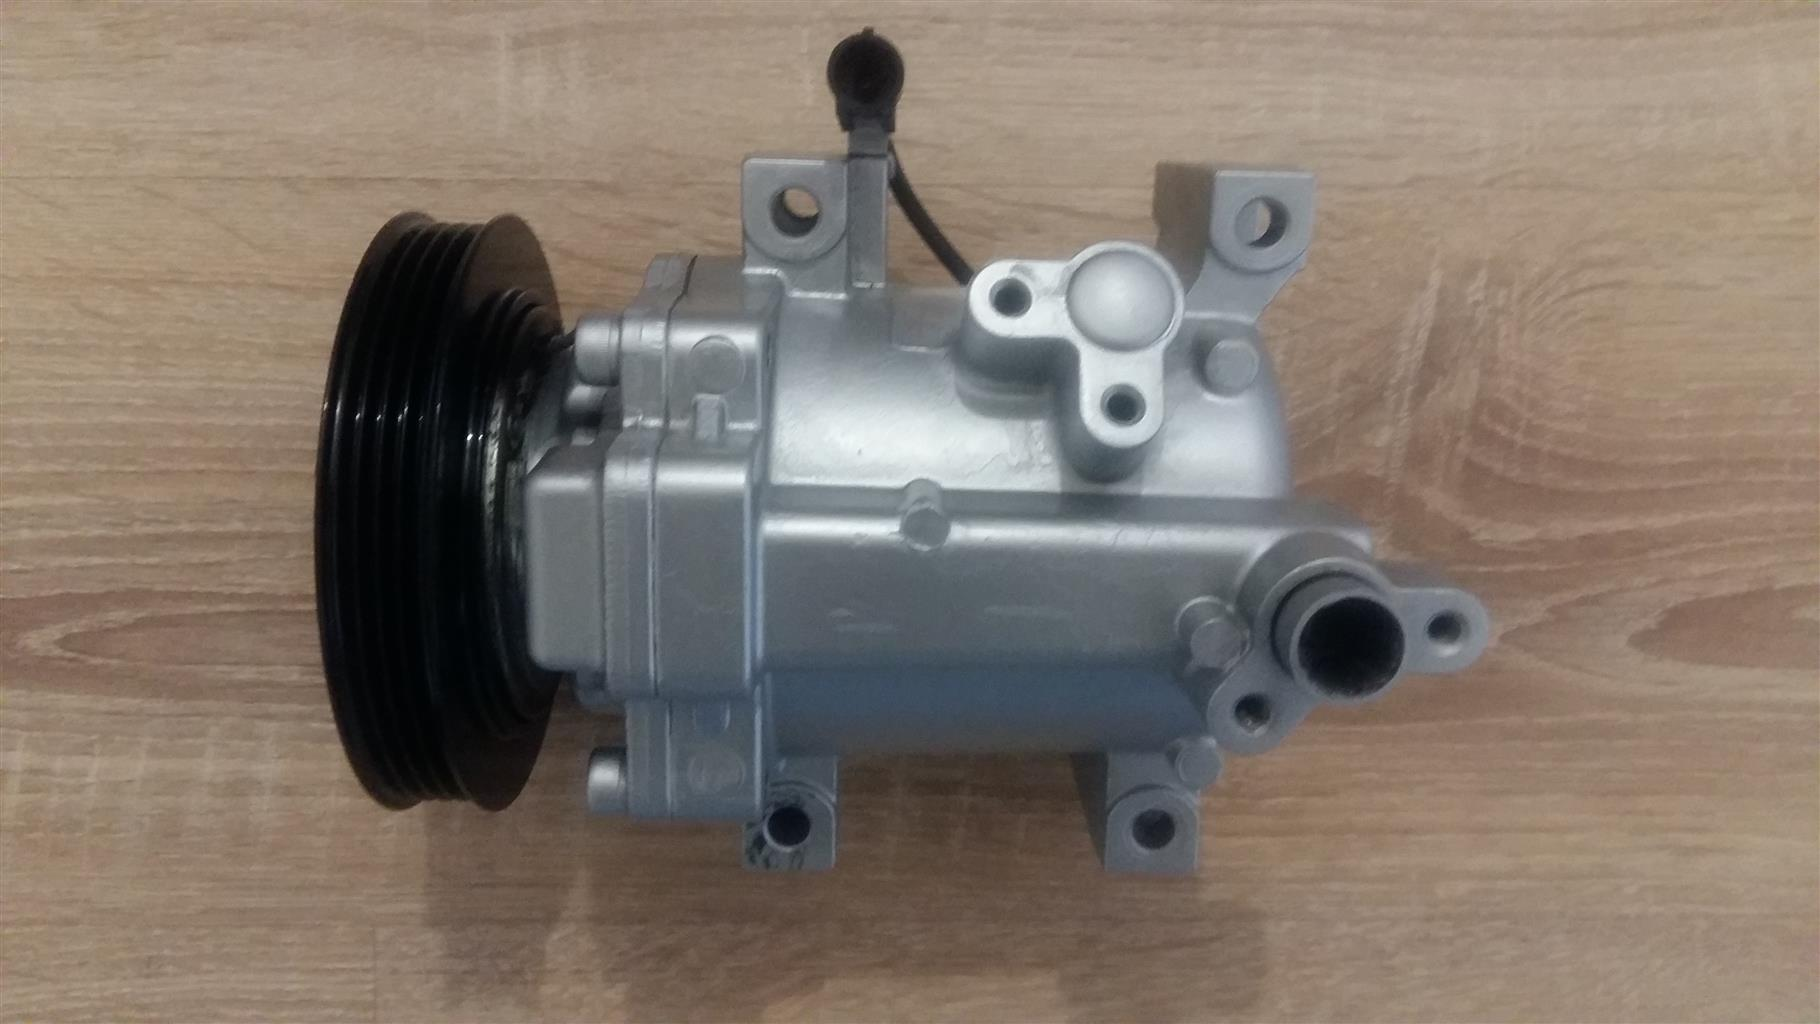 GWM C10 Aircon Compressor